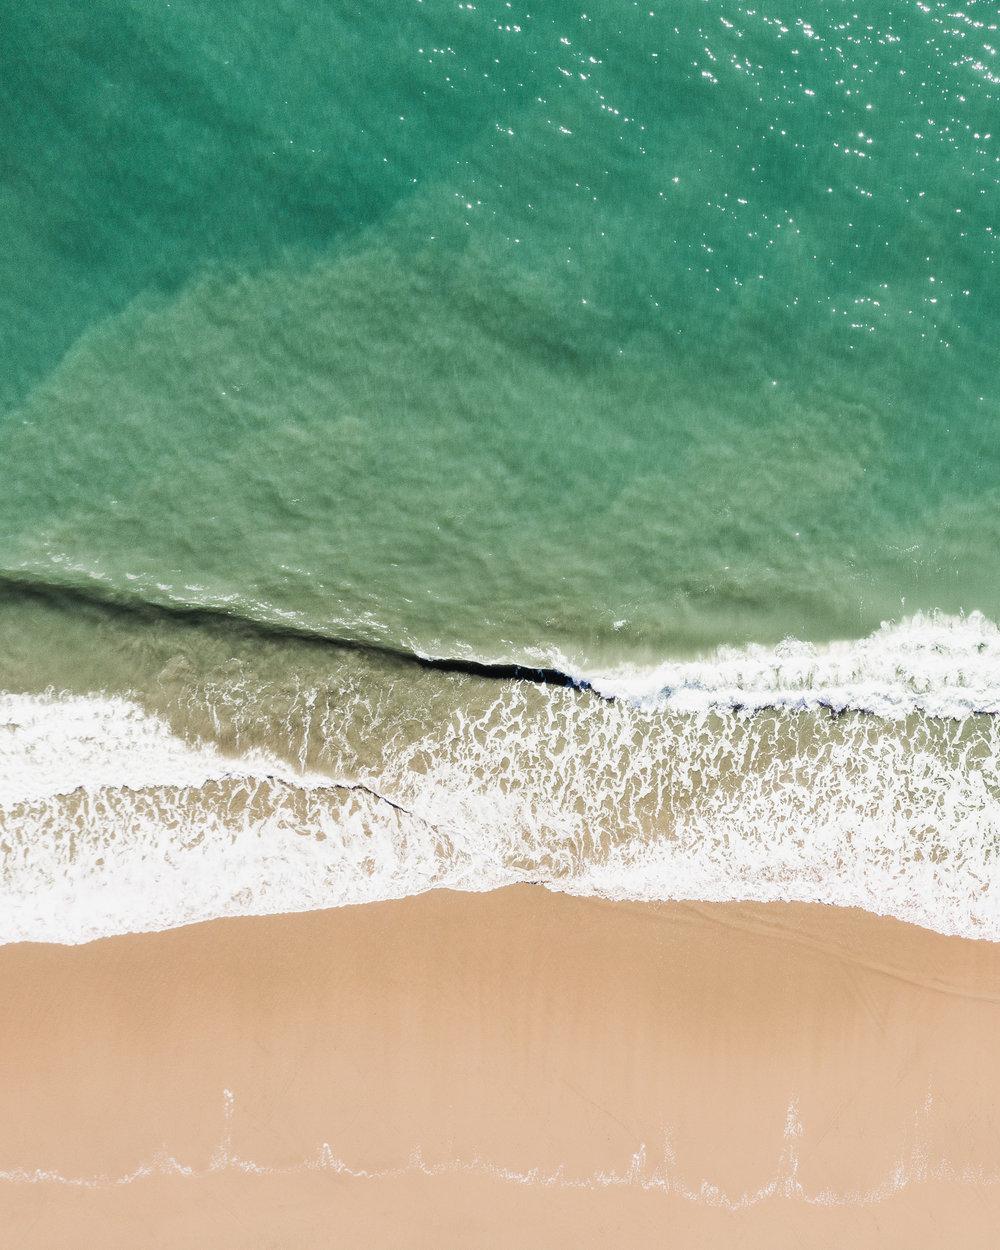 California-Tourism-Drone-Photographer-0005.jpg